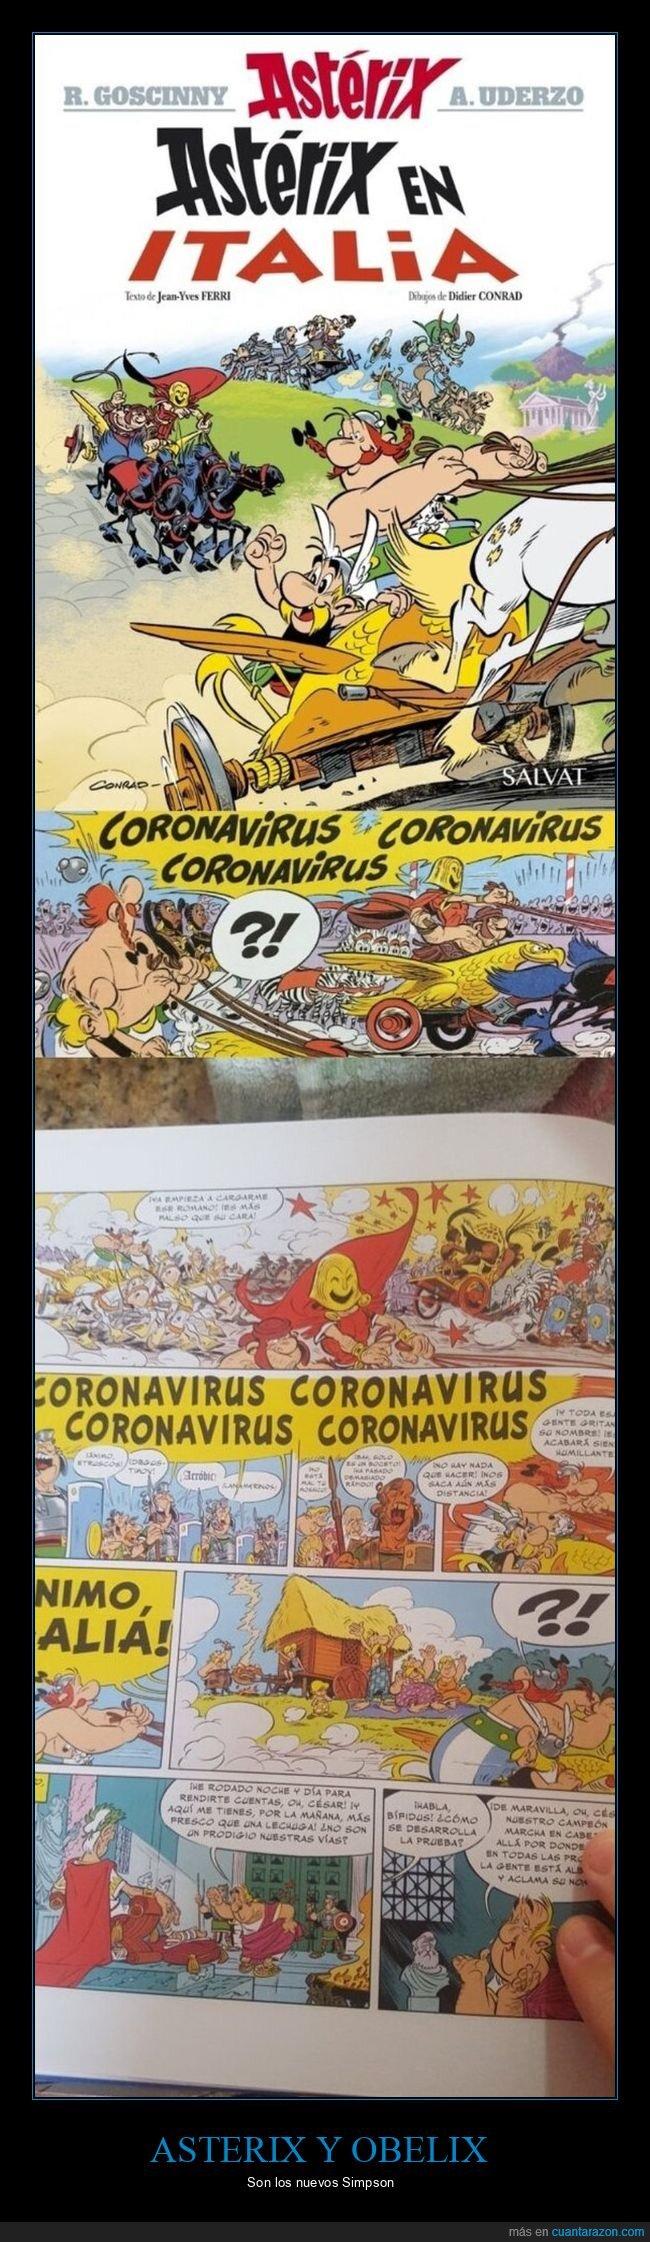 asterix,coronavirus,wtf